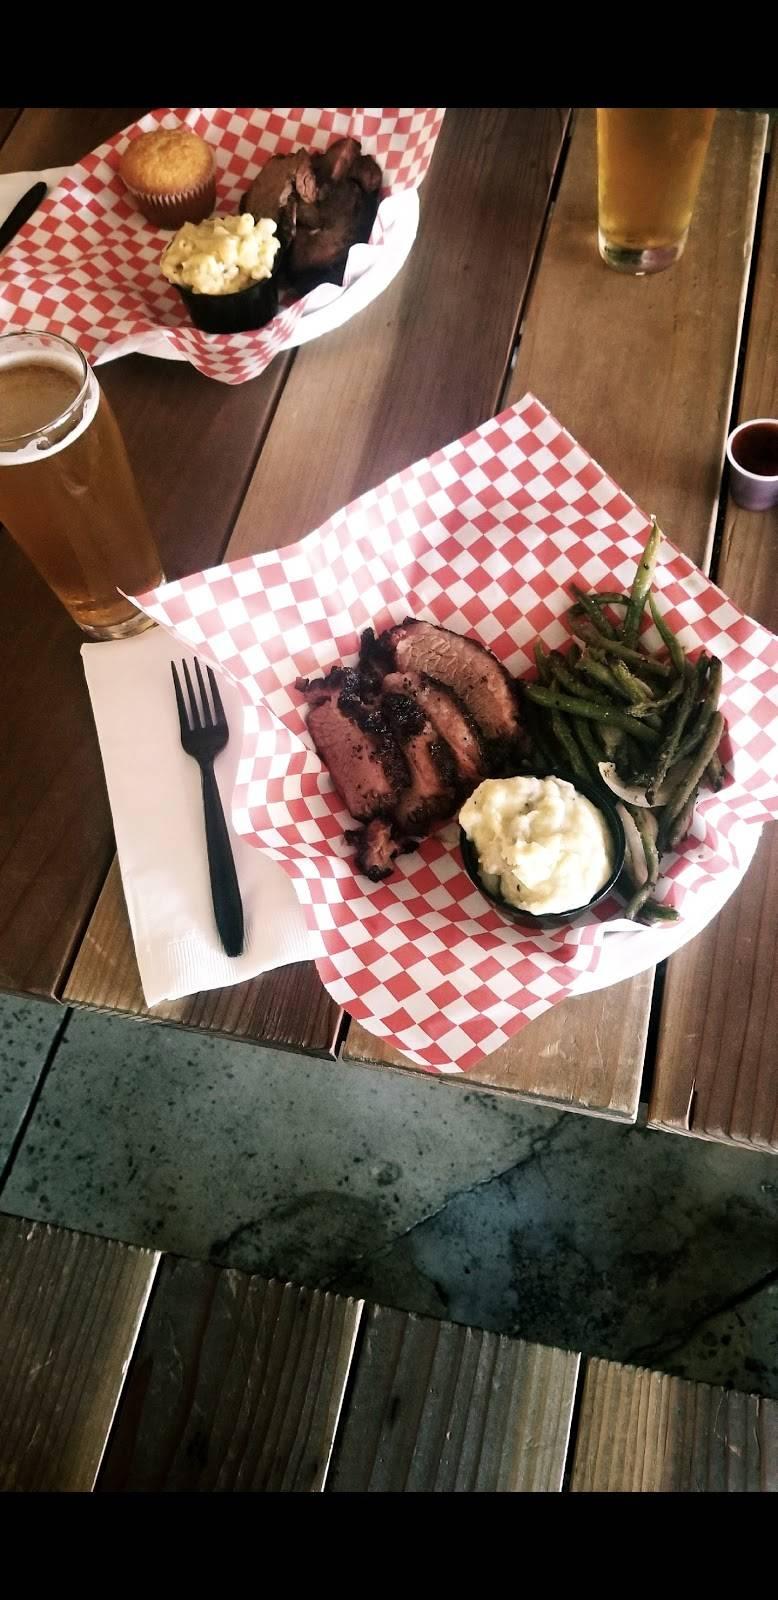 Javs Bar-B-Q   restaurant   500 S Anaheim Blvd #D, Anaheim, CA 92805, USA   7148442680 OR +1 714-844-2680